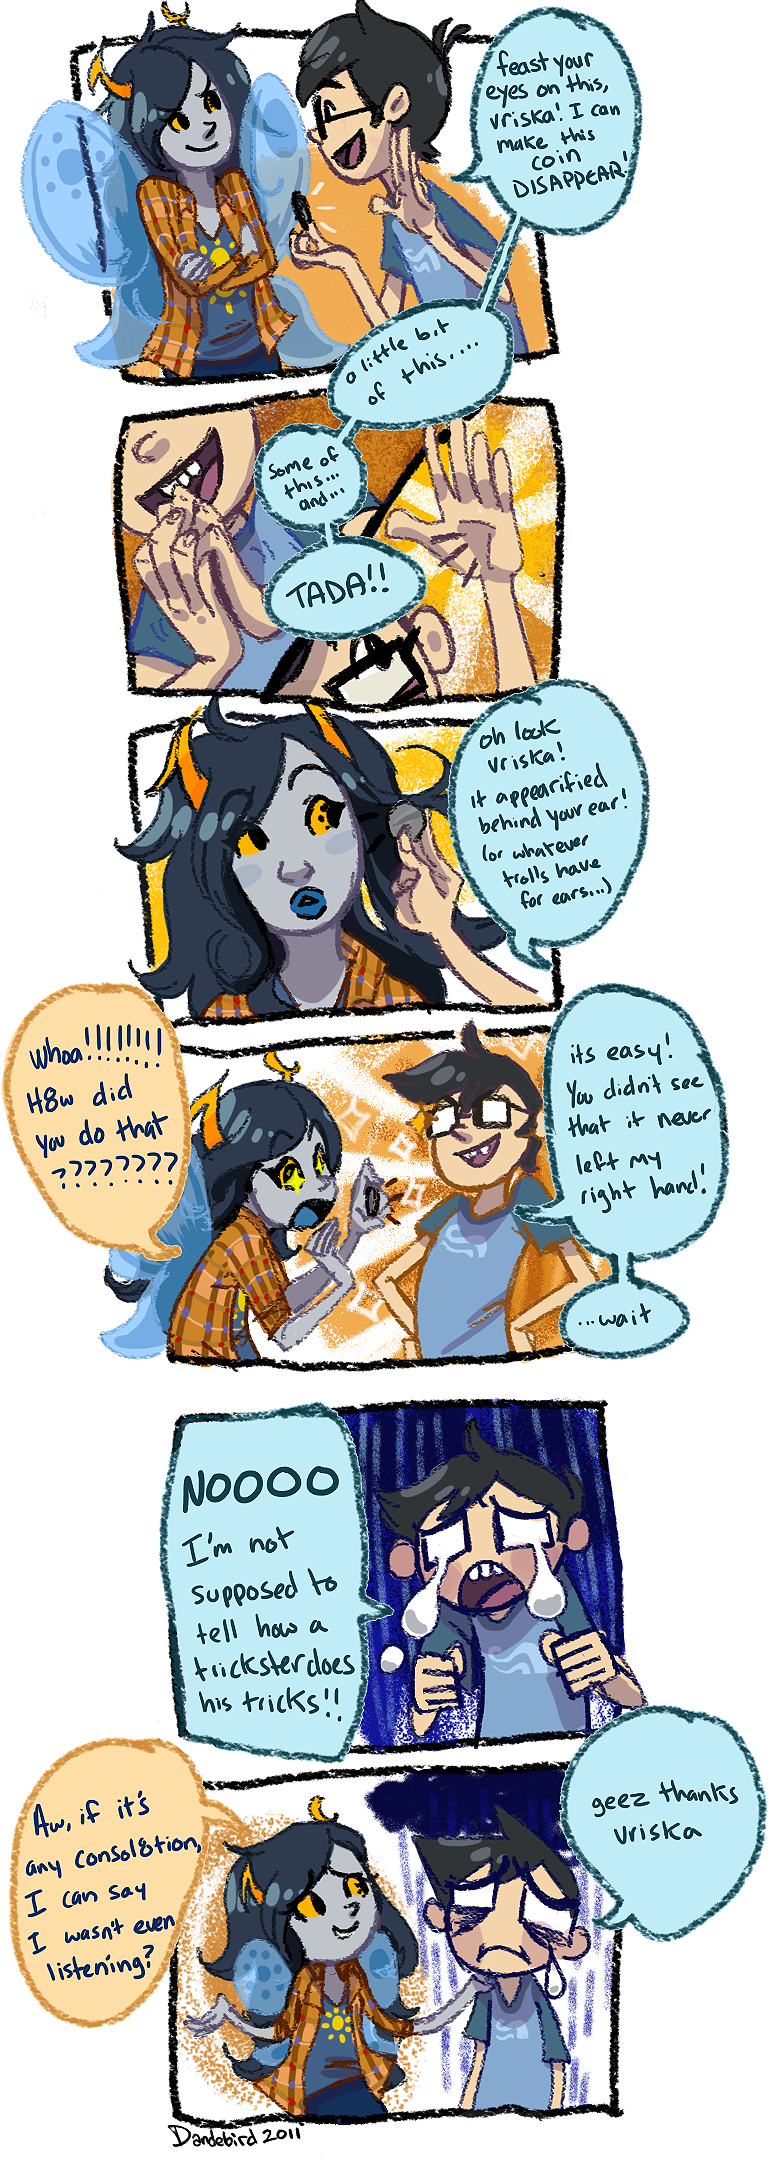 trickster's tricks by Dandebird